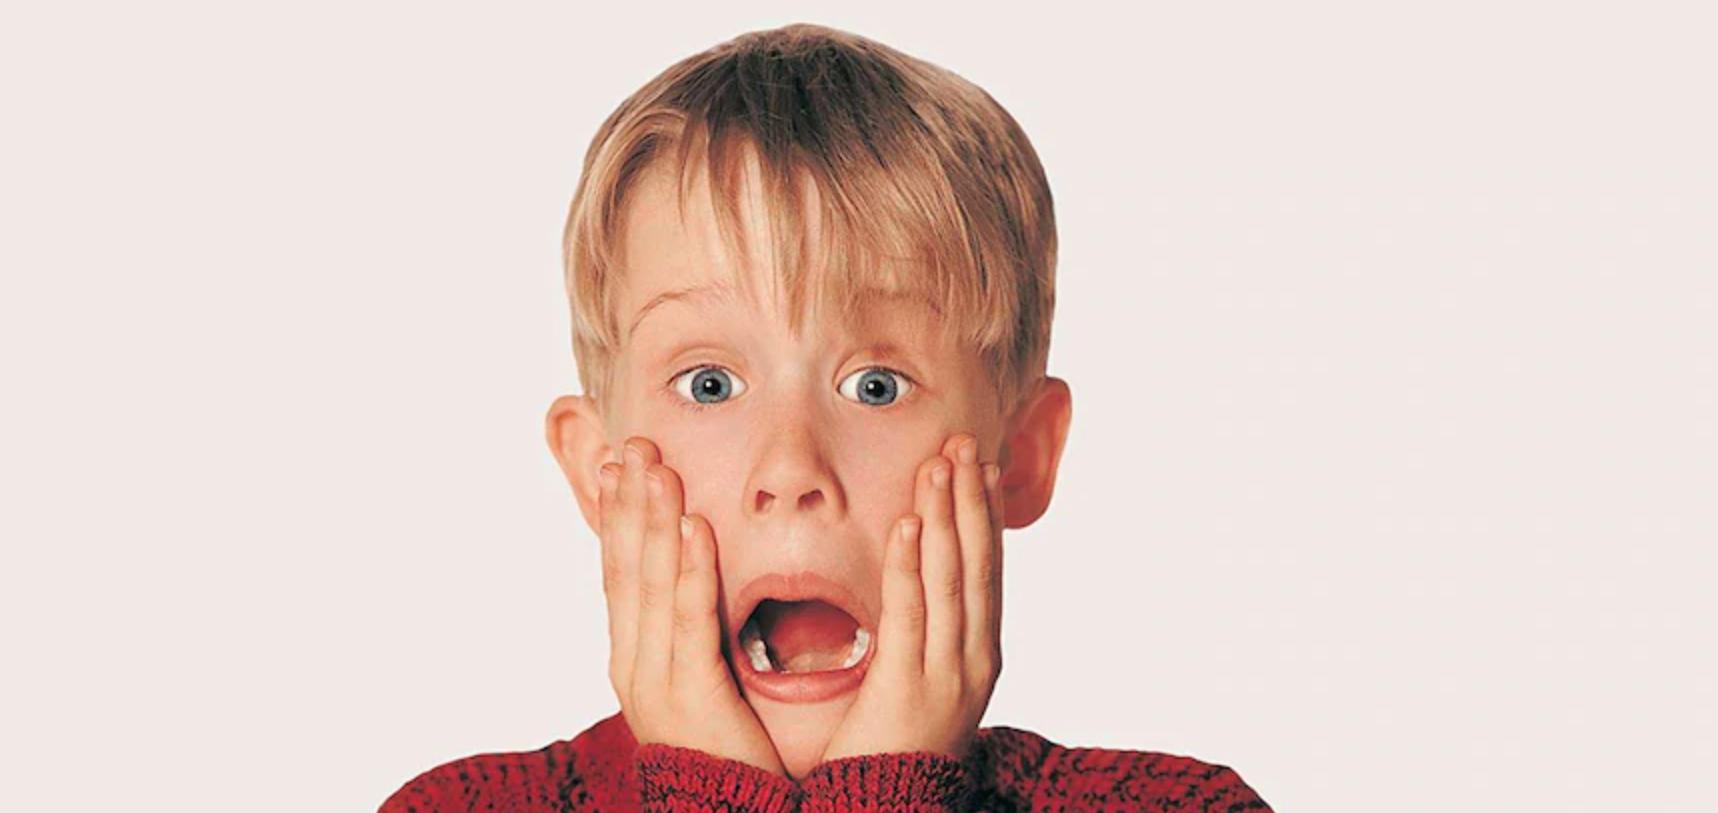 Macauly Caulkin as Kevin McAllister in Home Alone